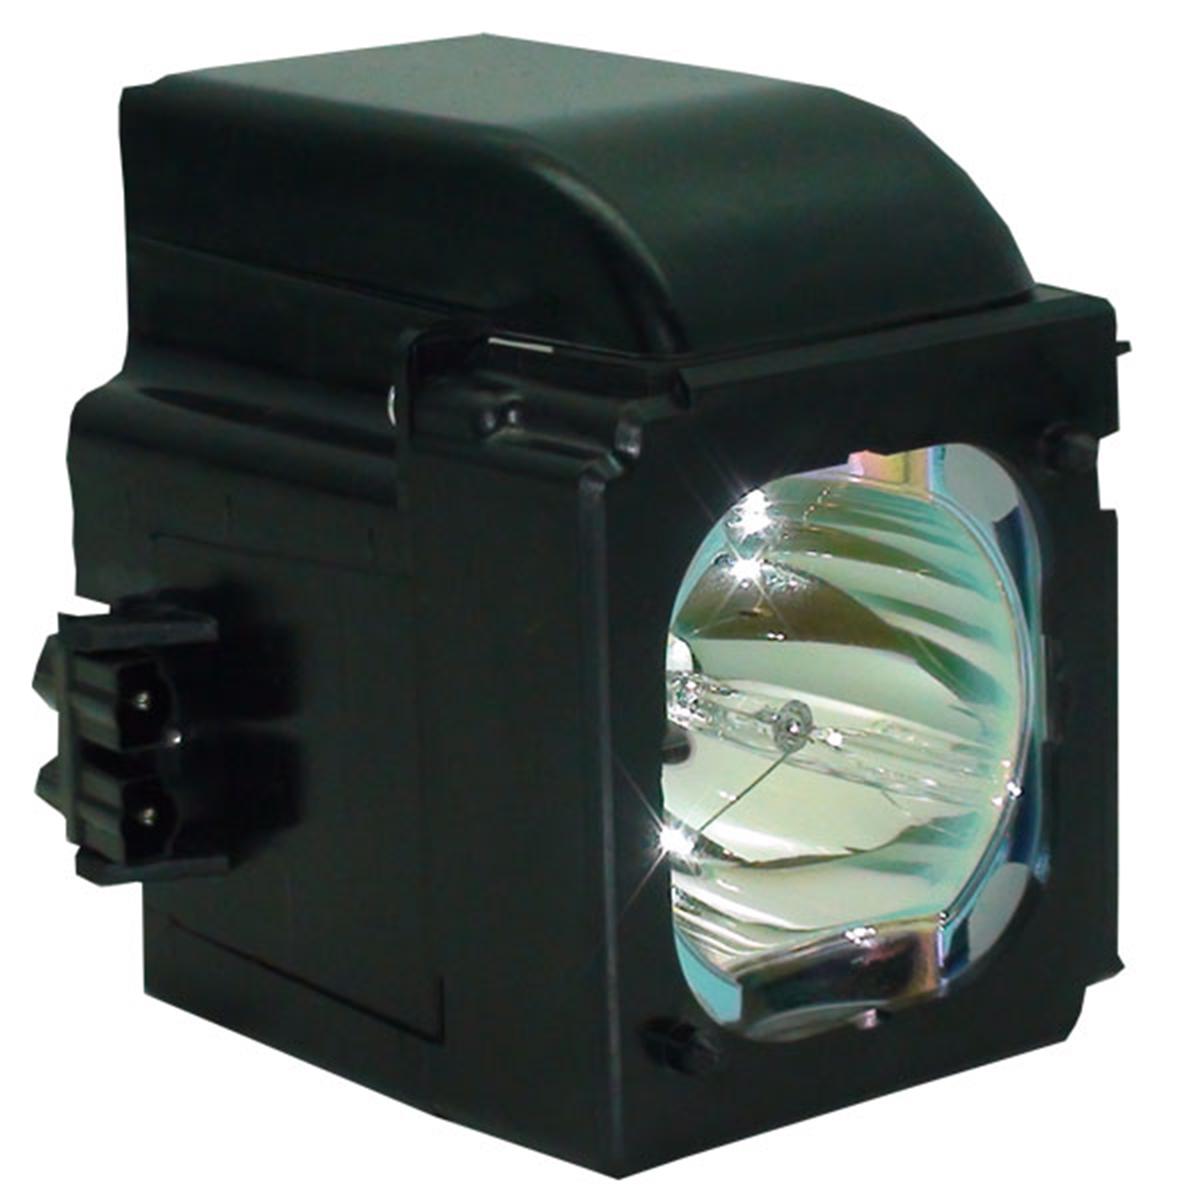 01653a bulb cartridge for samsung hls4676 tv lamp rptv bulbs ebay. Black Bedroom Furniture Sets. Home Design Ideas